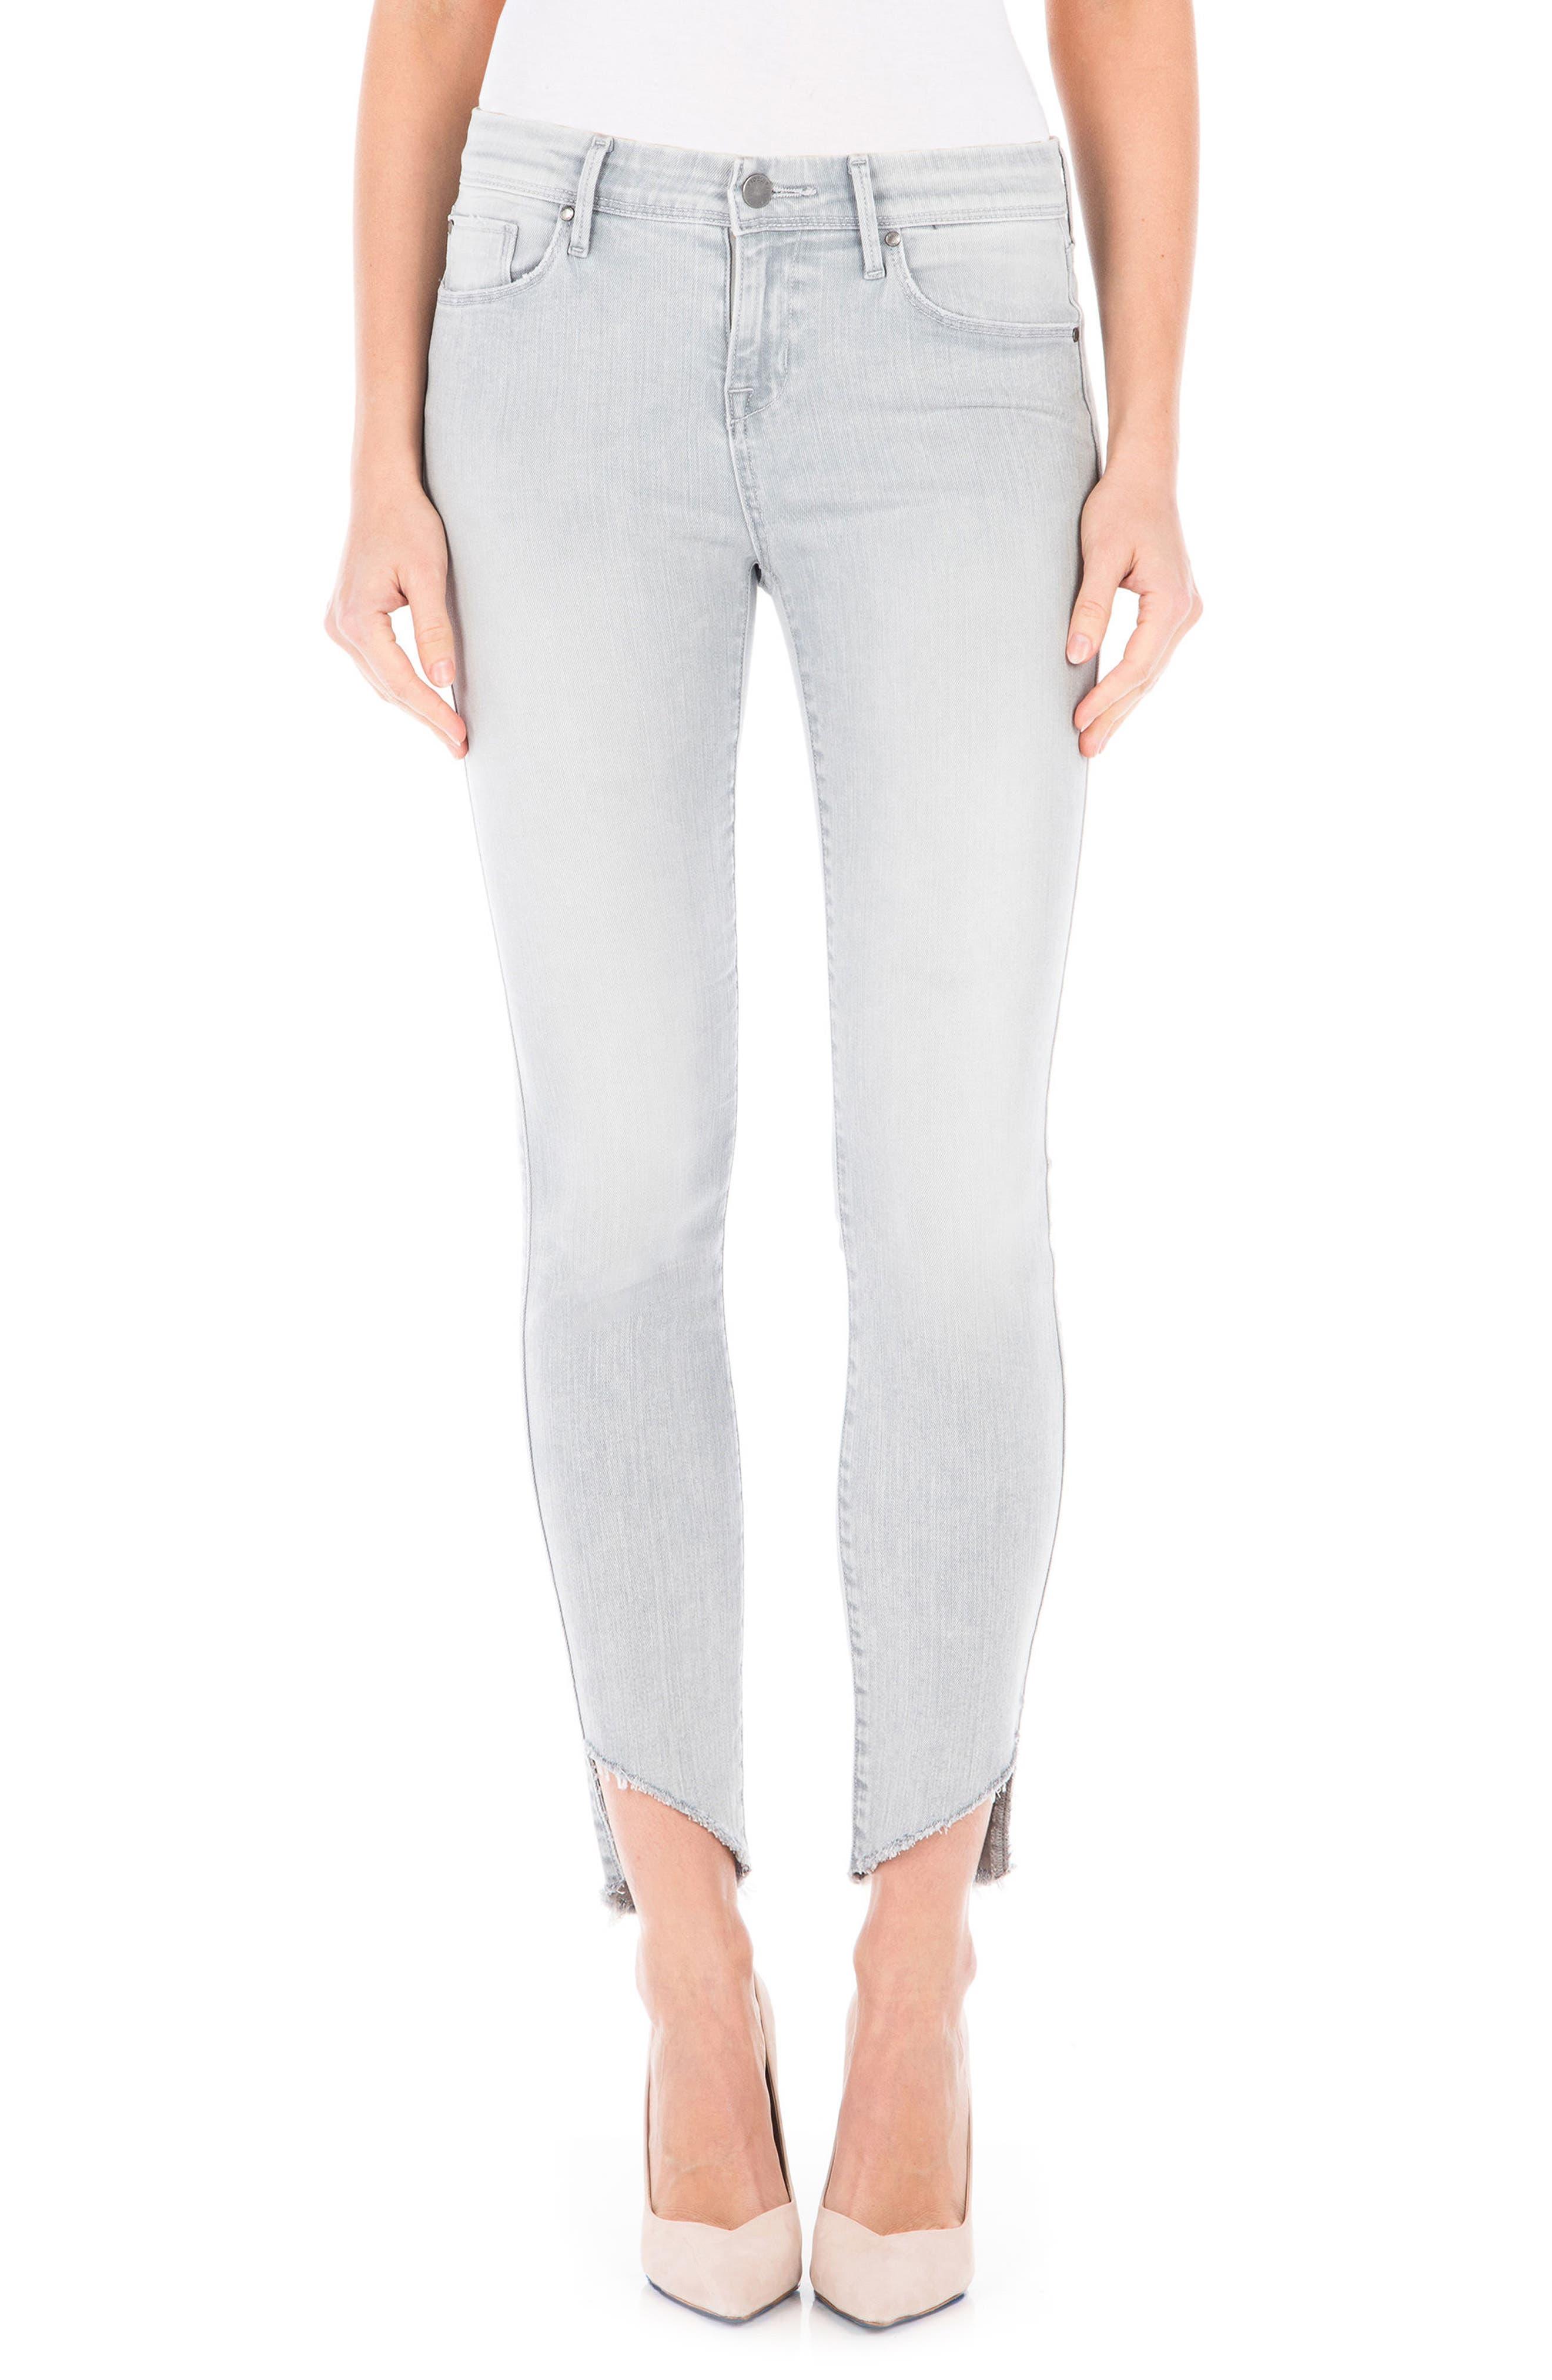 Sola Skinny Jeans,                         Main,                         color, Quartz